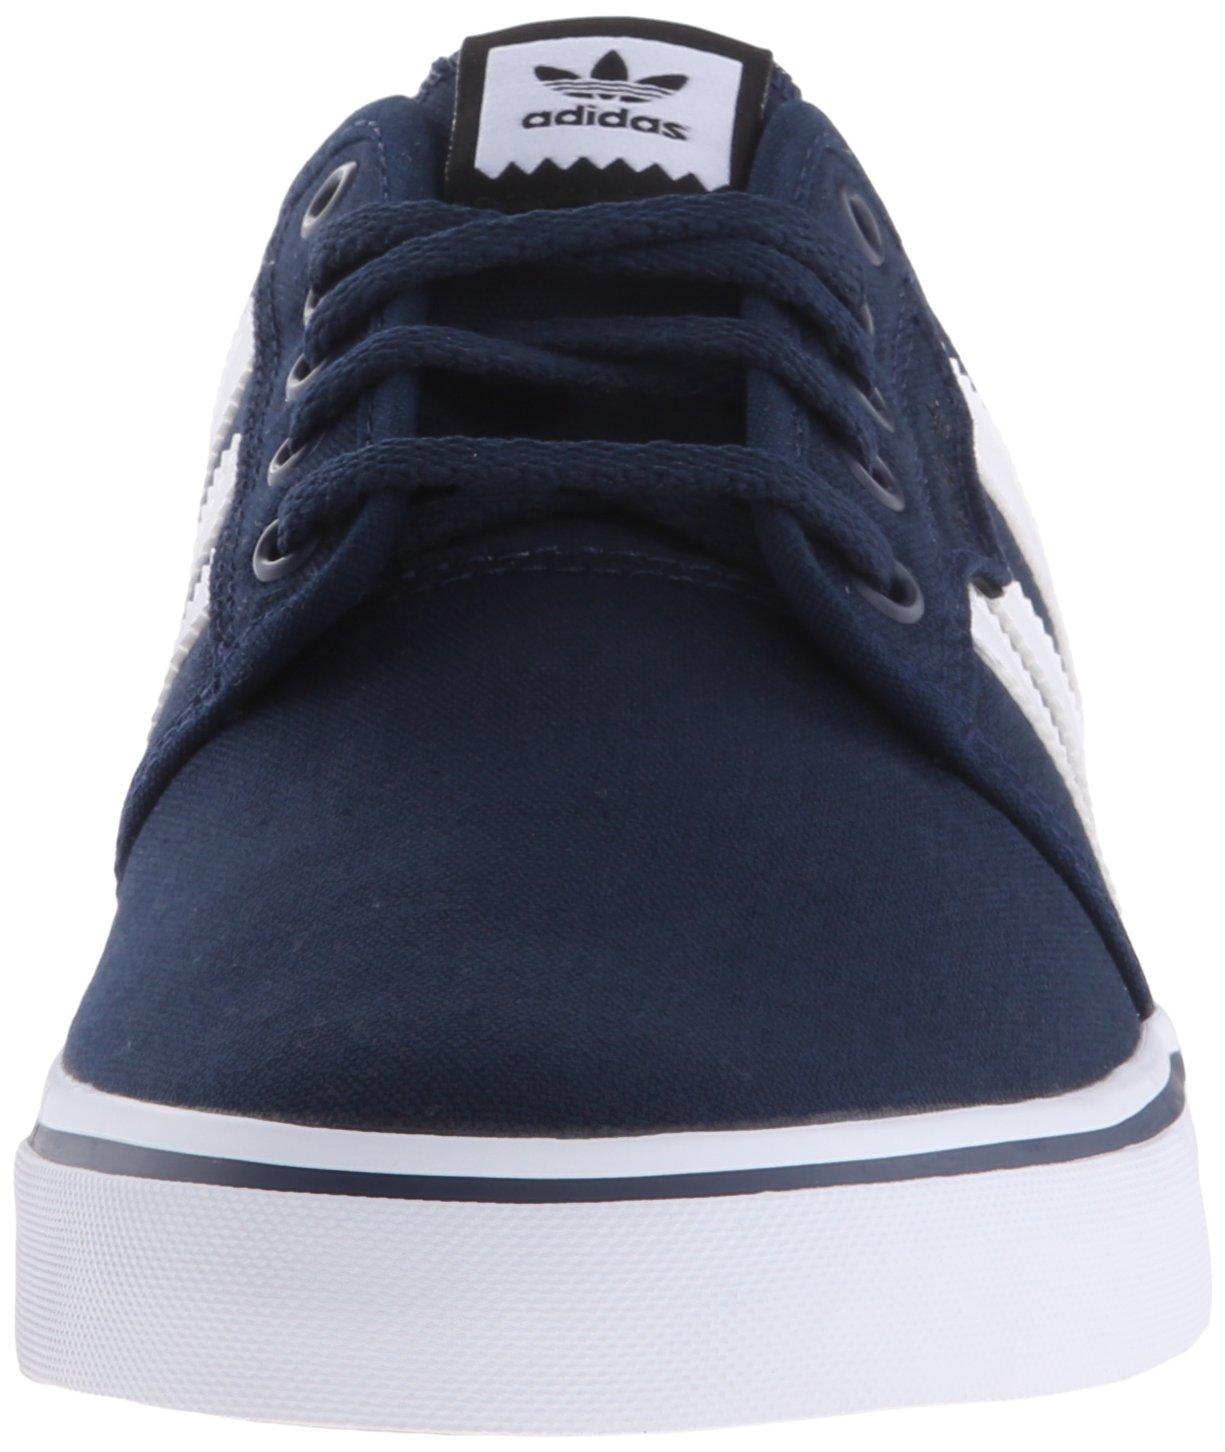 quality design 73886 4db90 Zapatillas de skate adidas Seeley para hombre Colegial azul marino   blanco    negro